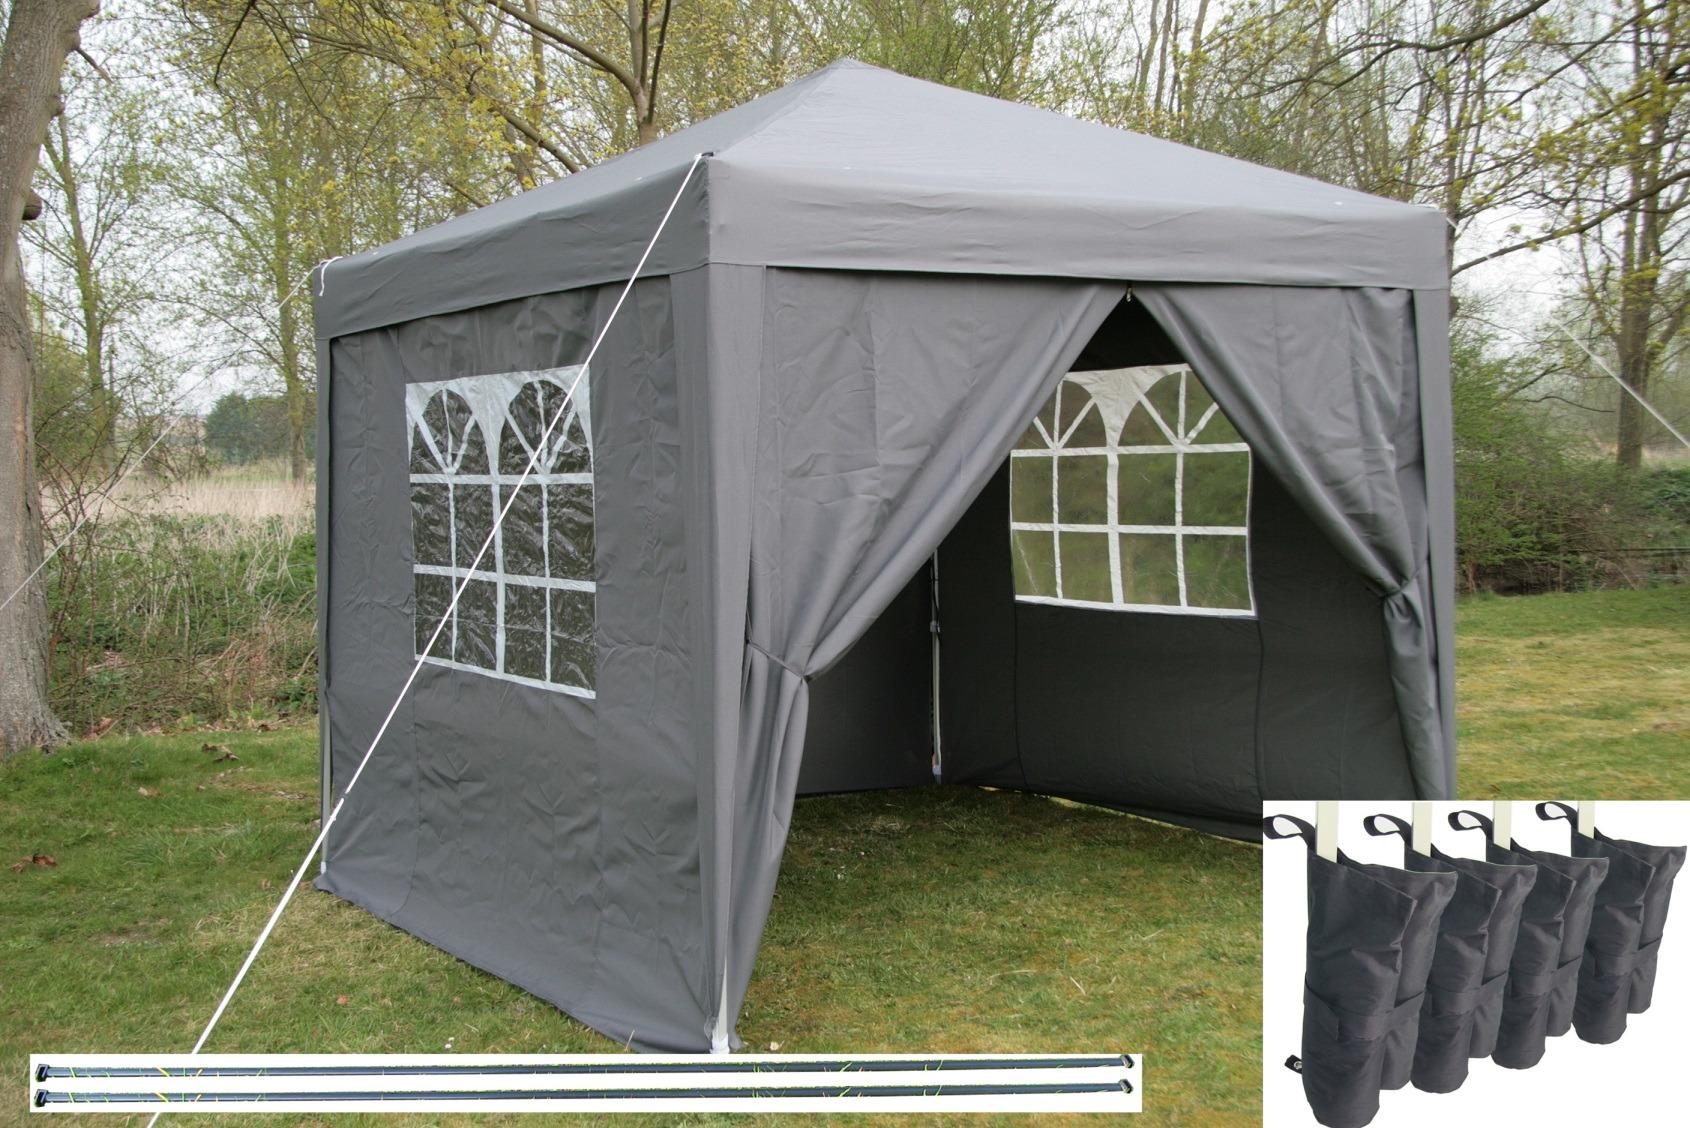 airwave pop up gazebo tanche pavillon de jardin 2 windbars 4 jambe poids ebay. Black Bedroom Furniture Sets. Home Design Ideas